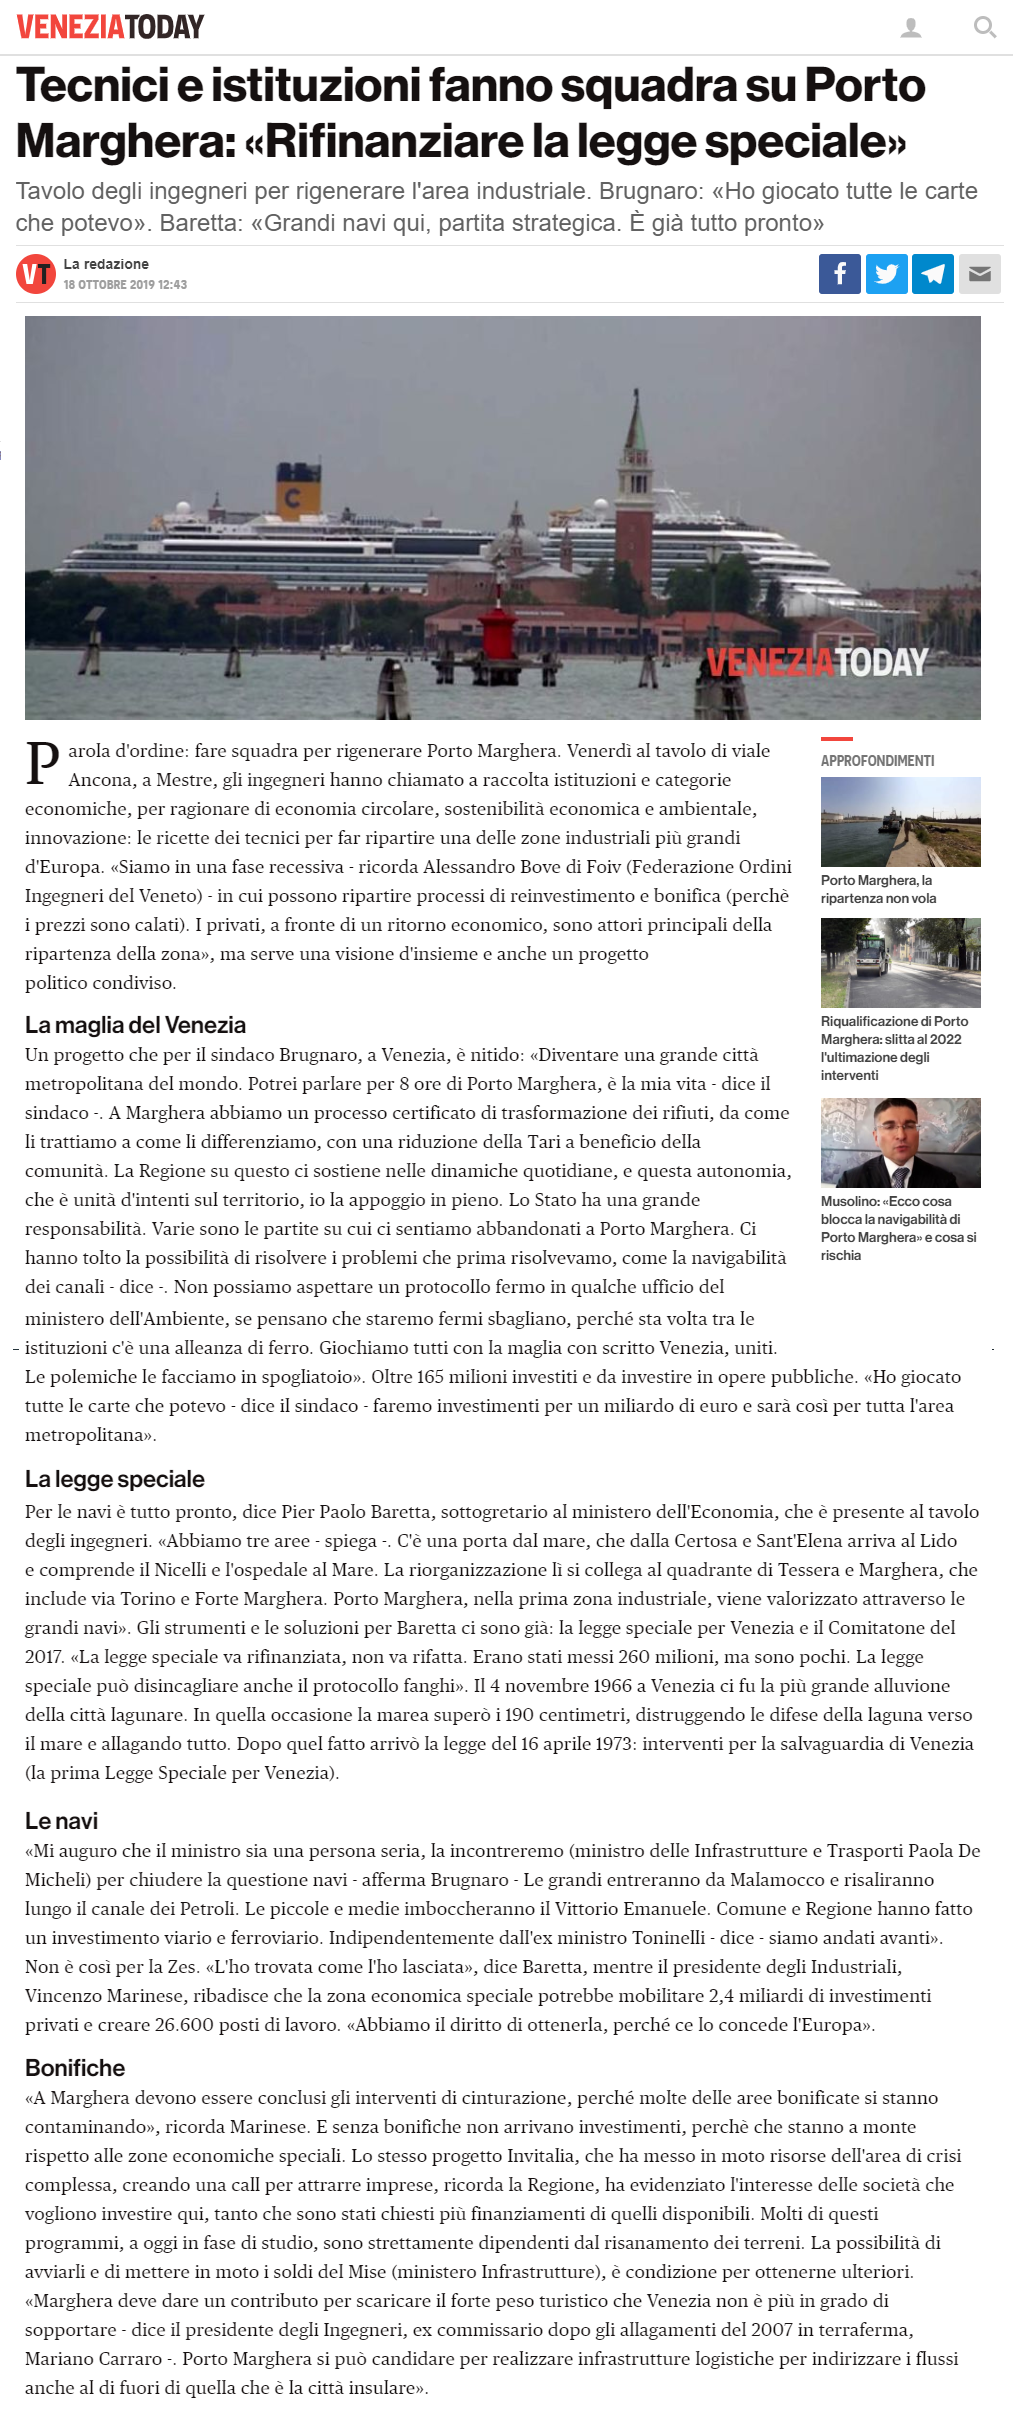 01.0 18.10.2019 Venezia Today Rigenerare Porto Marghera - Ordine Ingengeri Venezia FOIV.png